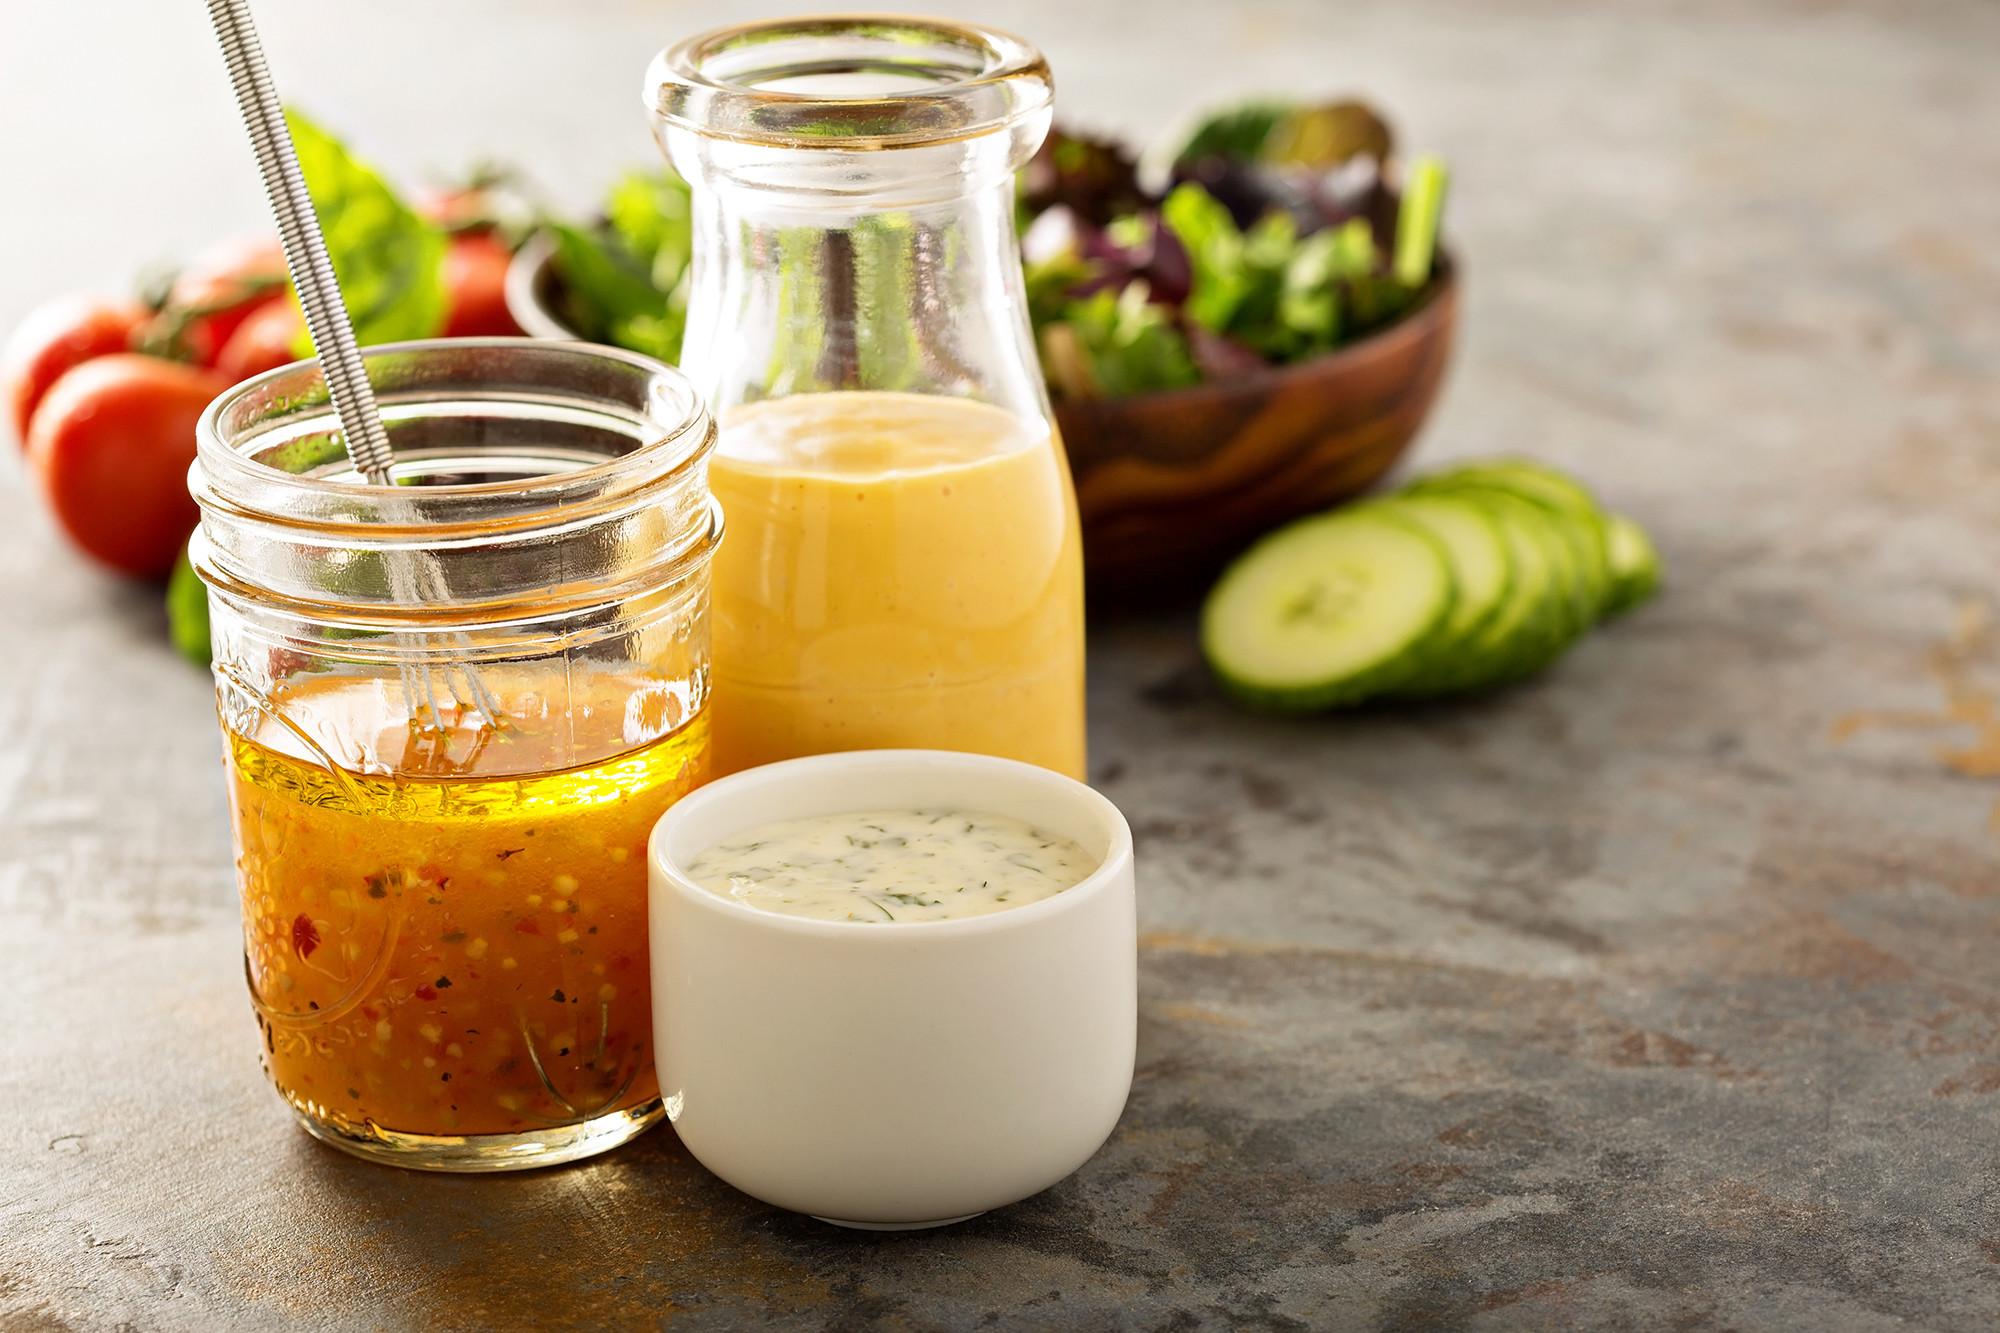 Заправки для салатов готовят на основе сметаны, майонеза и масла